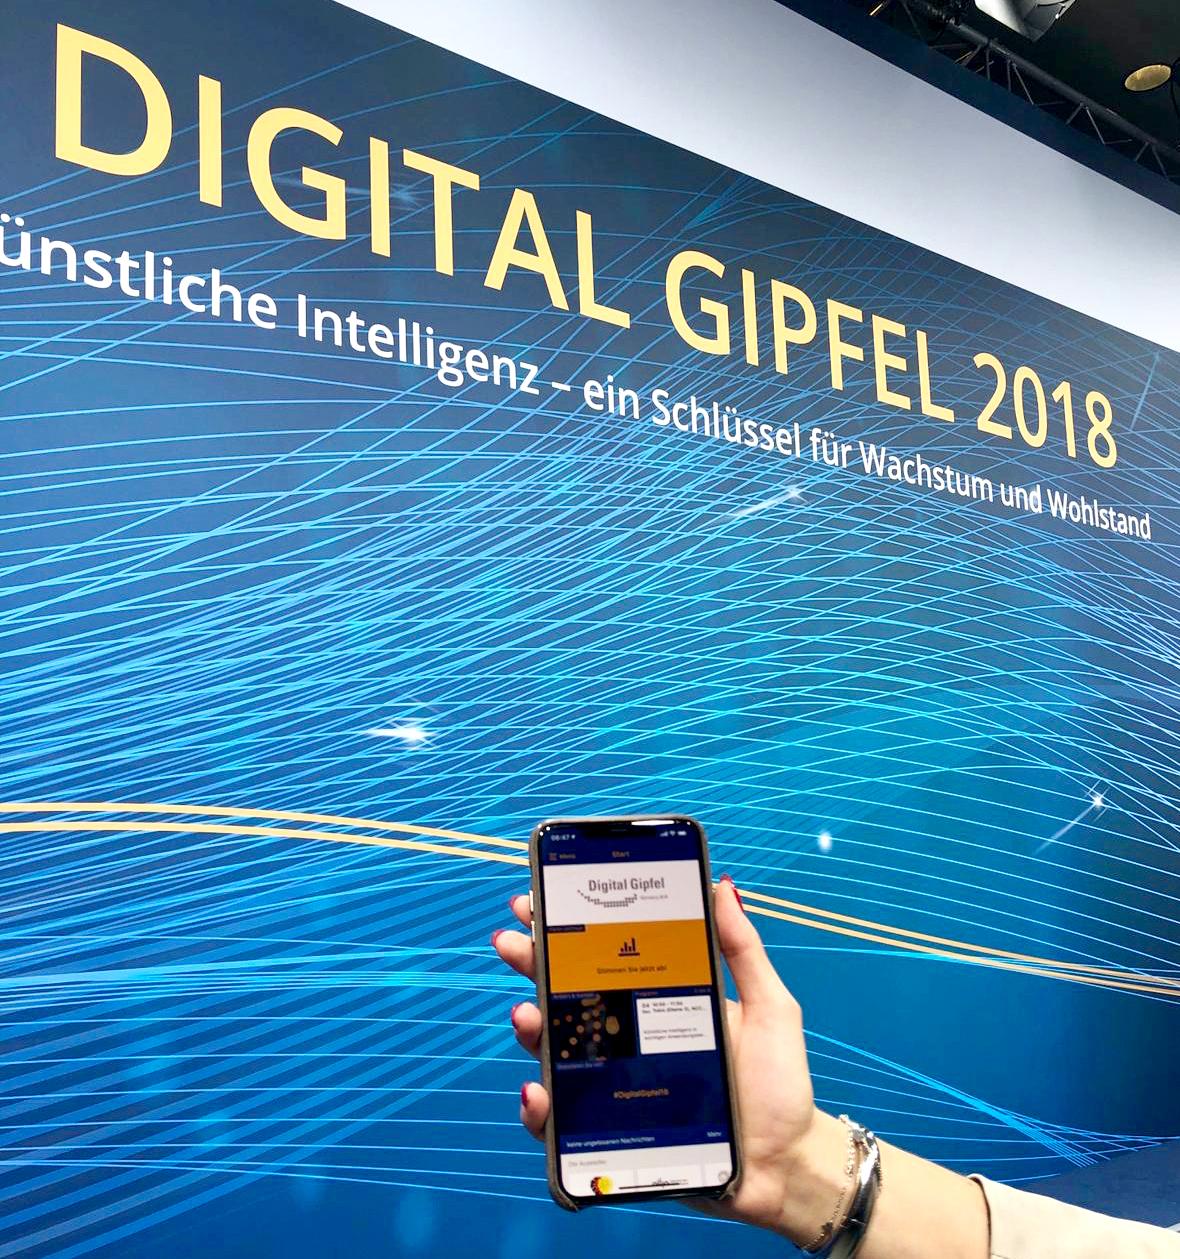 Digital Gipfel mit App